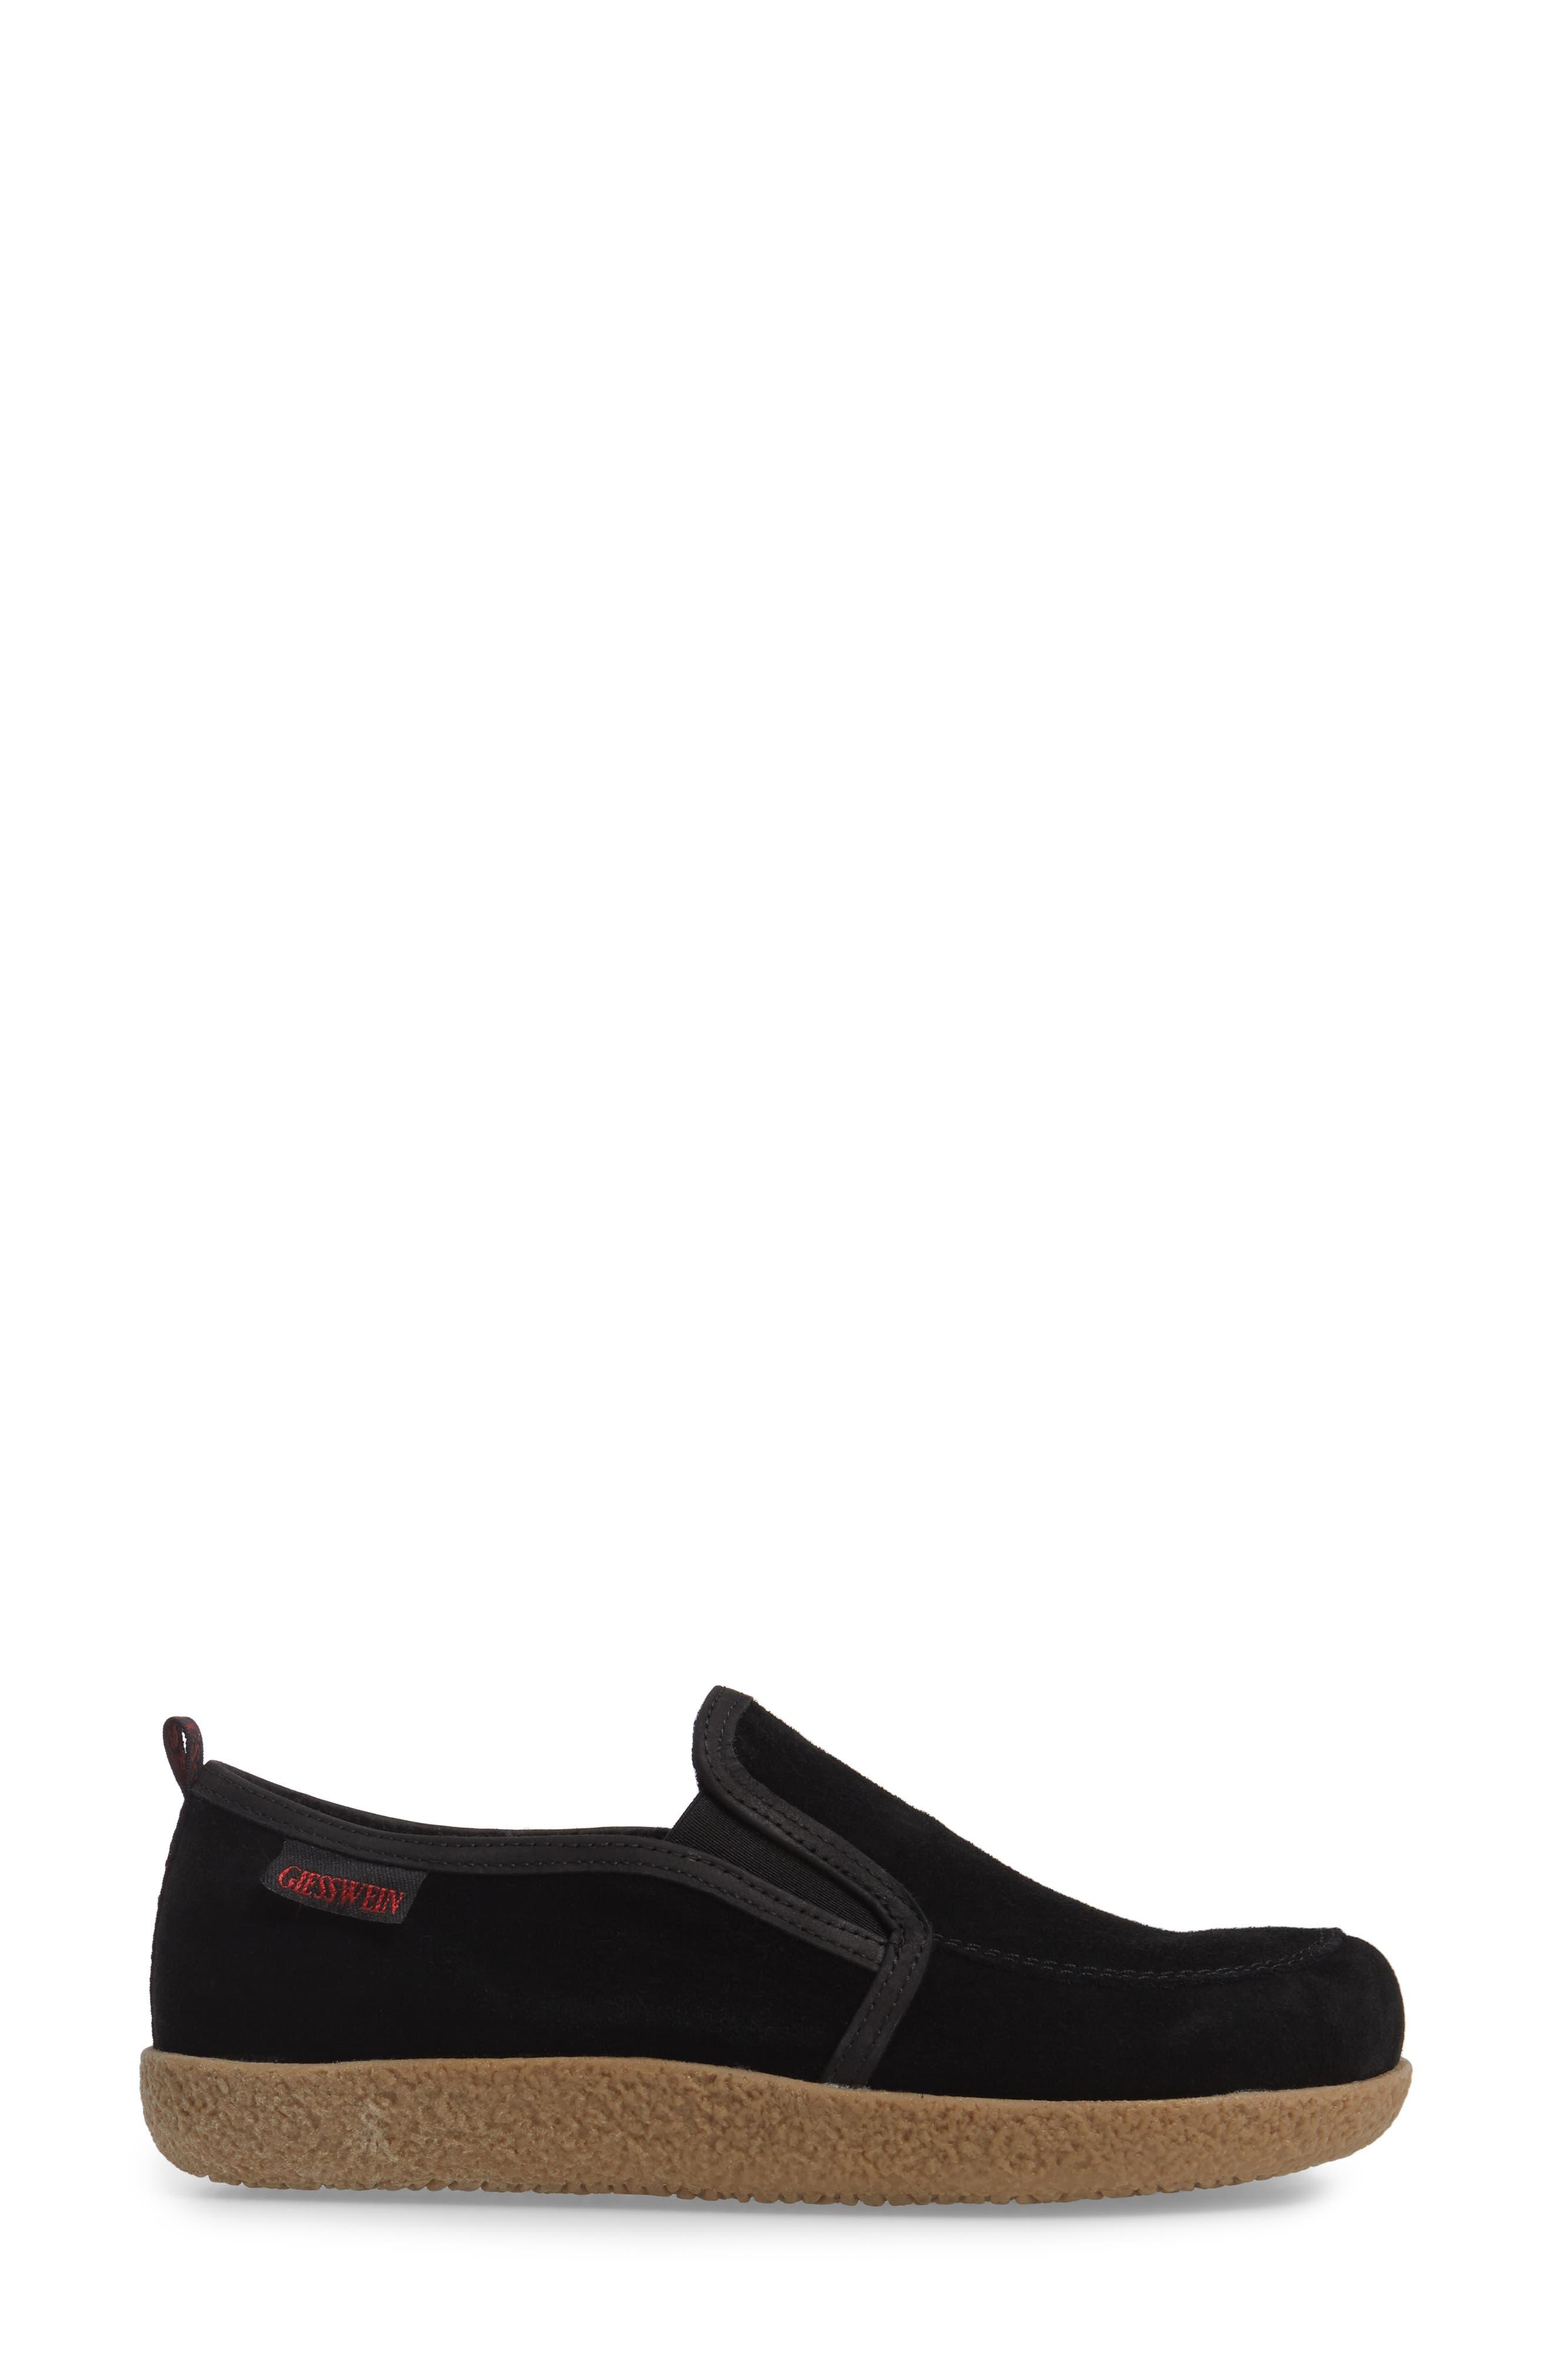 Alpen Loafer,                             Alternate thumbnail 3, color,                             BLACK WOOL